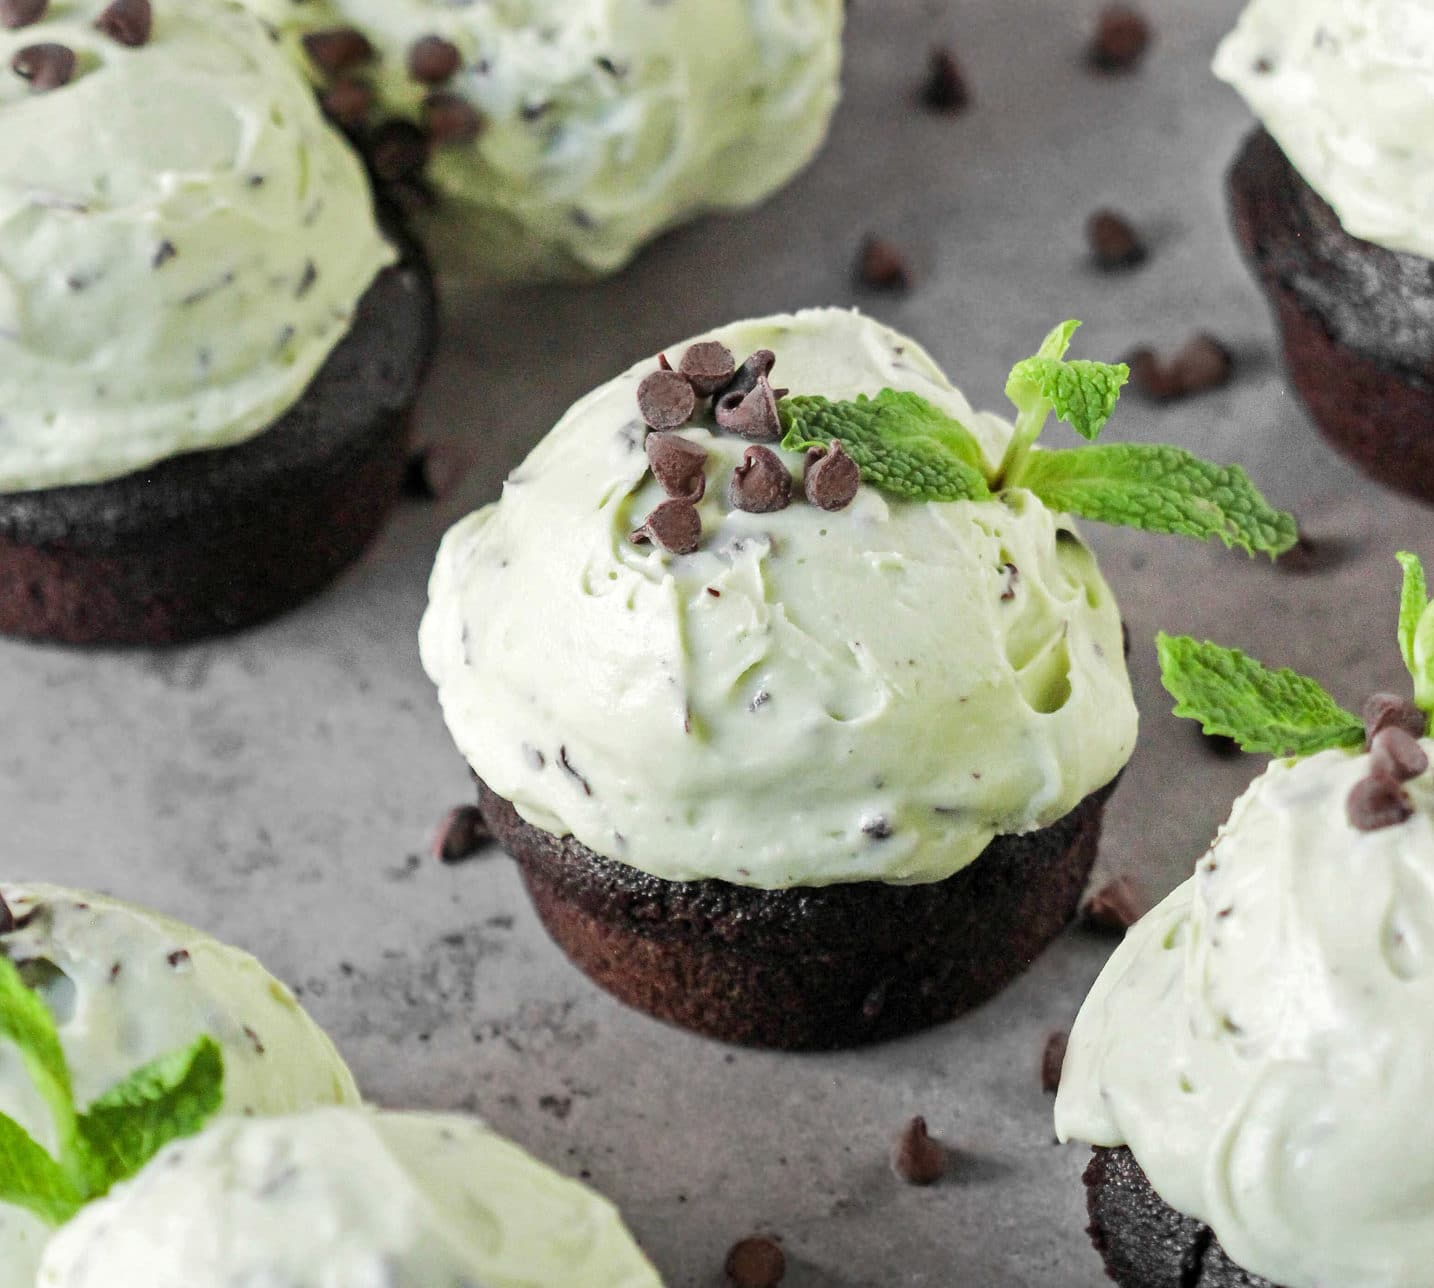 Mint-Chocolate-Cupcakes4-e1512925382624.